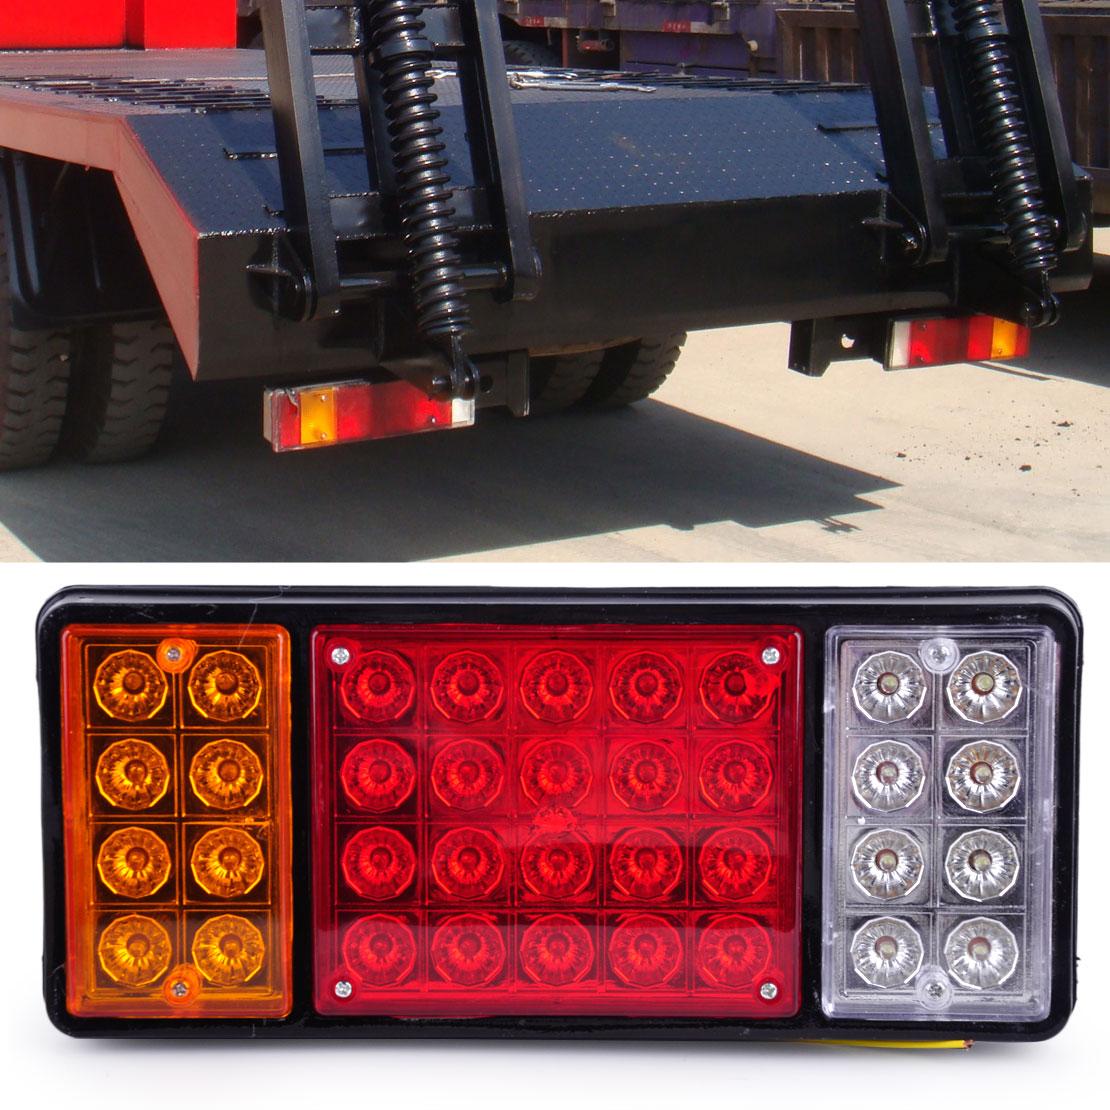 12V 36 LED Rear Turn Signal Truck Trailer Stop Tail Lights Indicator Lamp Caravan External Light fit for Trailers Trucks Boat